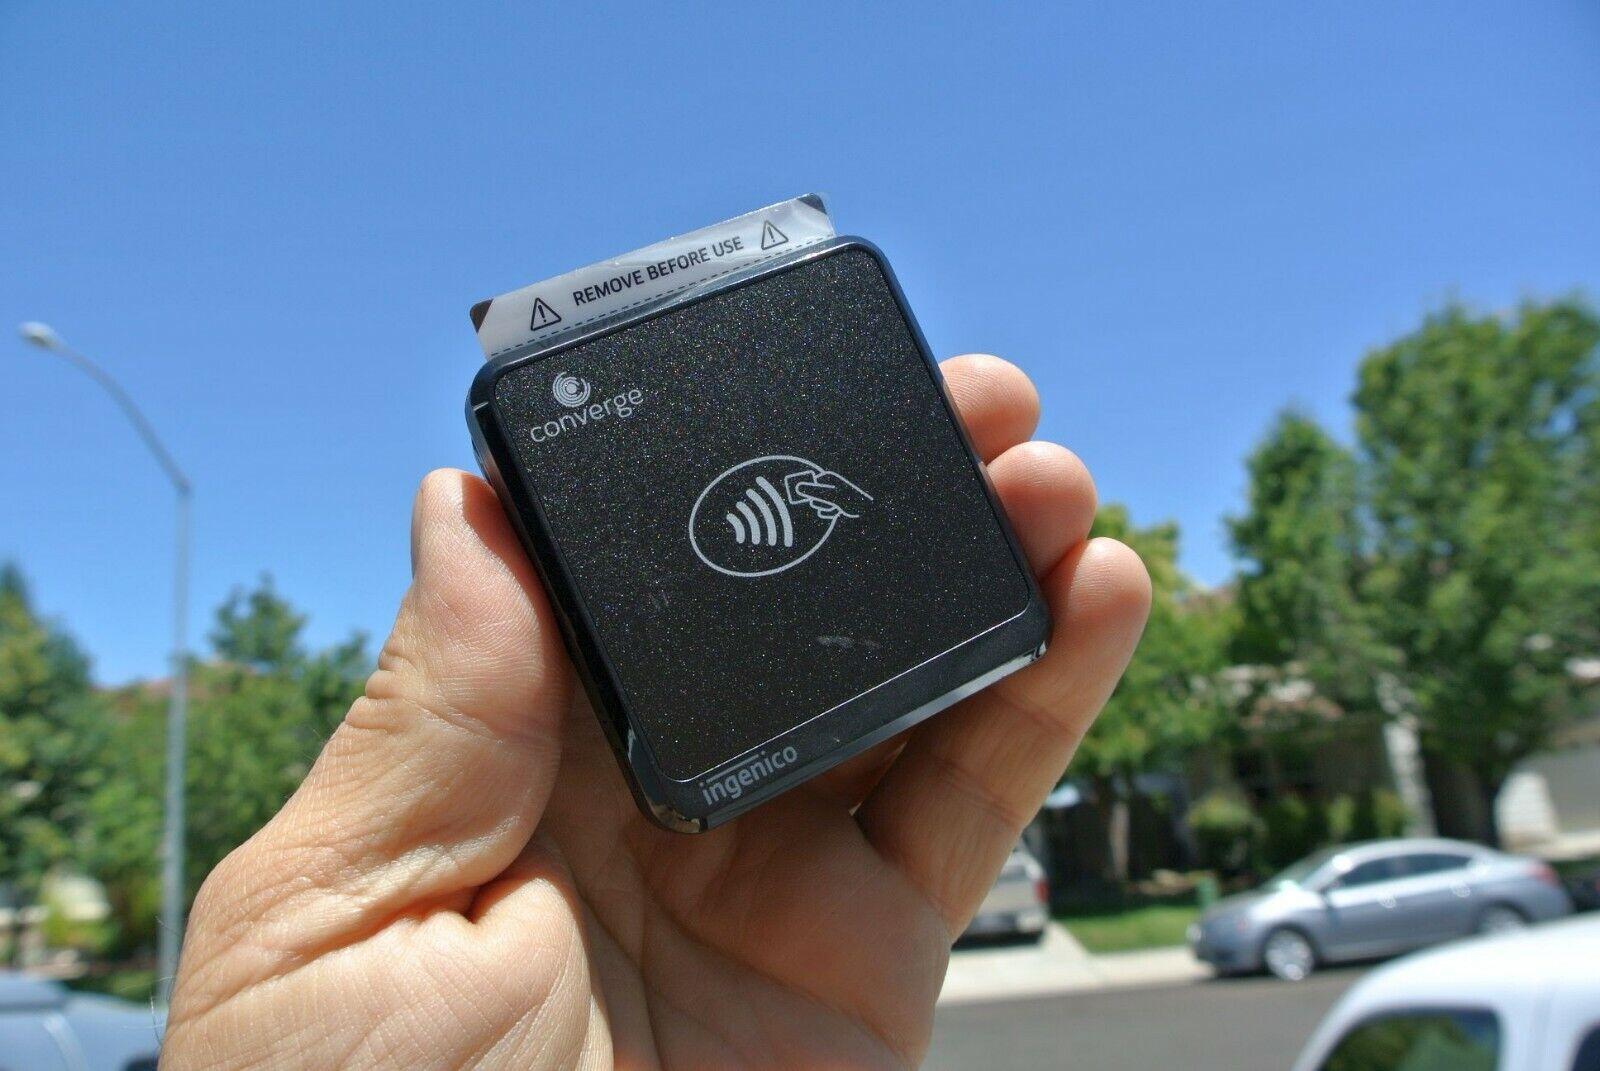 Debit card reader humidifier and dehumidifier